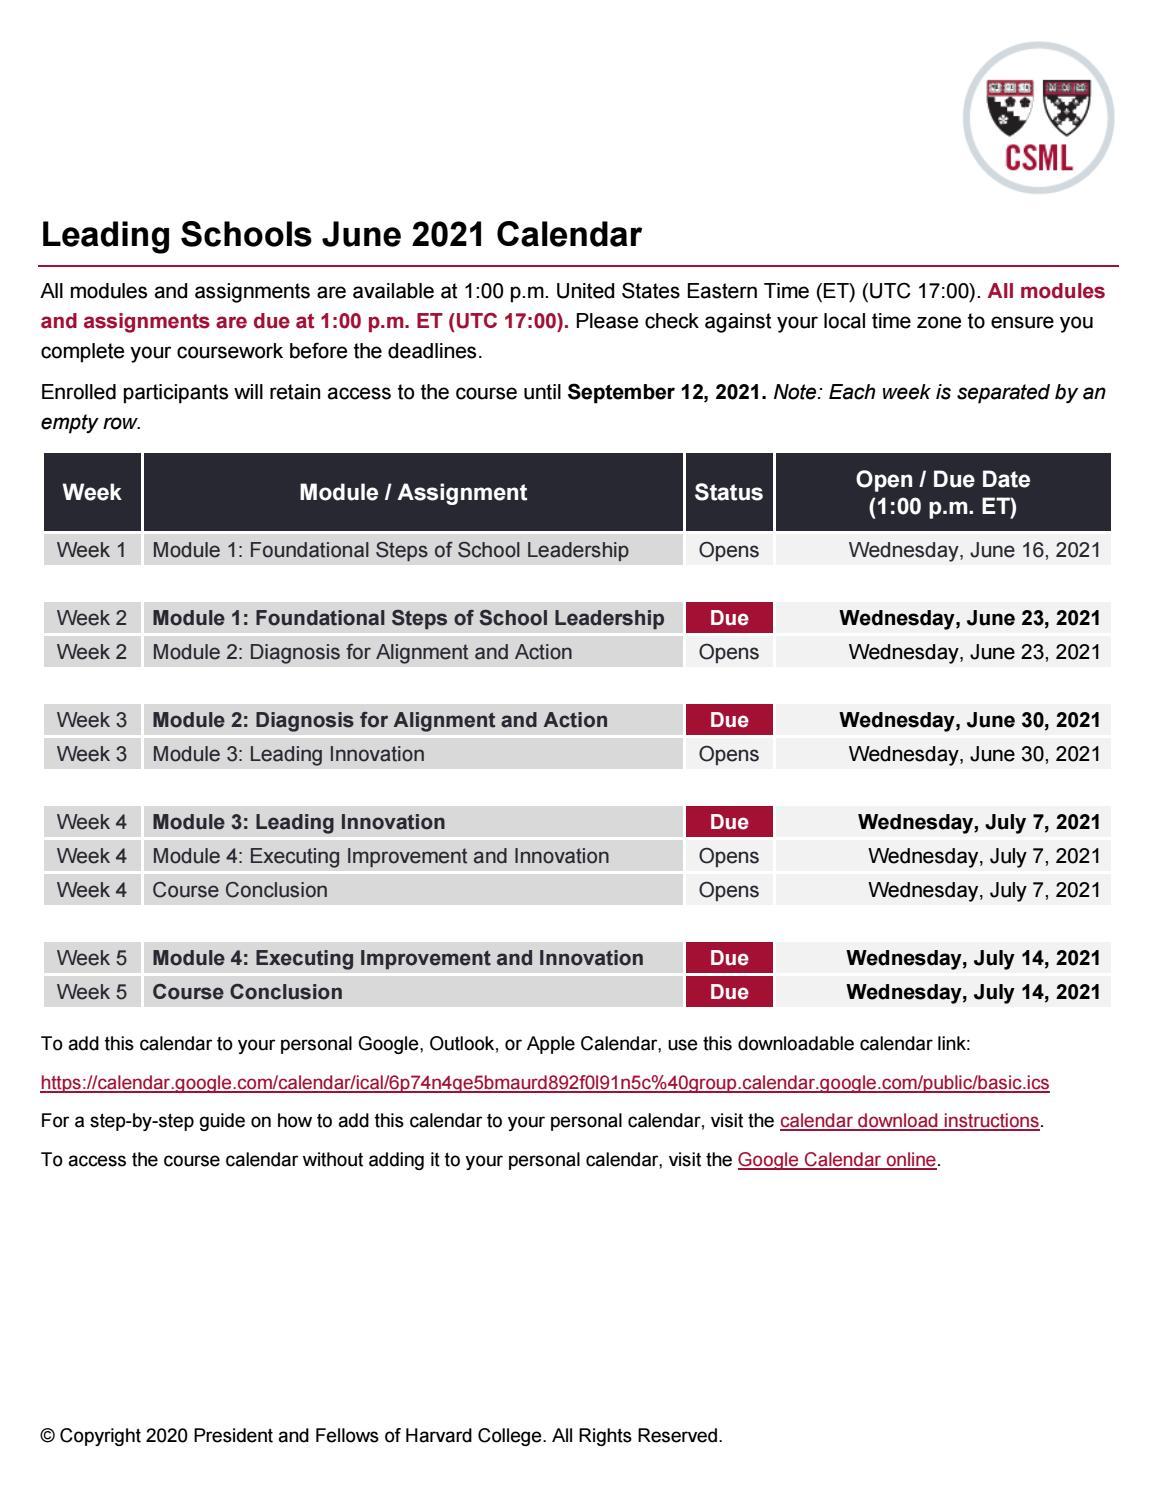 Utc 2021 Calendar Certificate in School Management and Leadership: Leading Schools